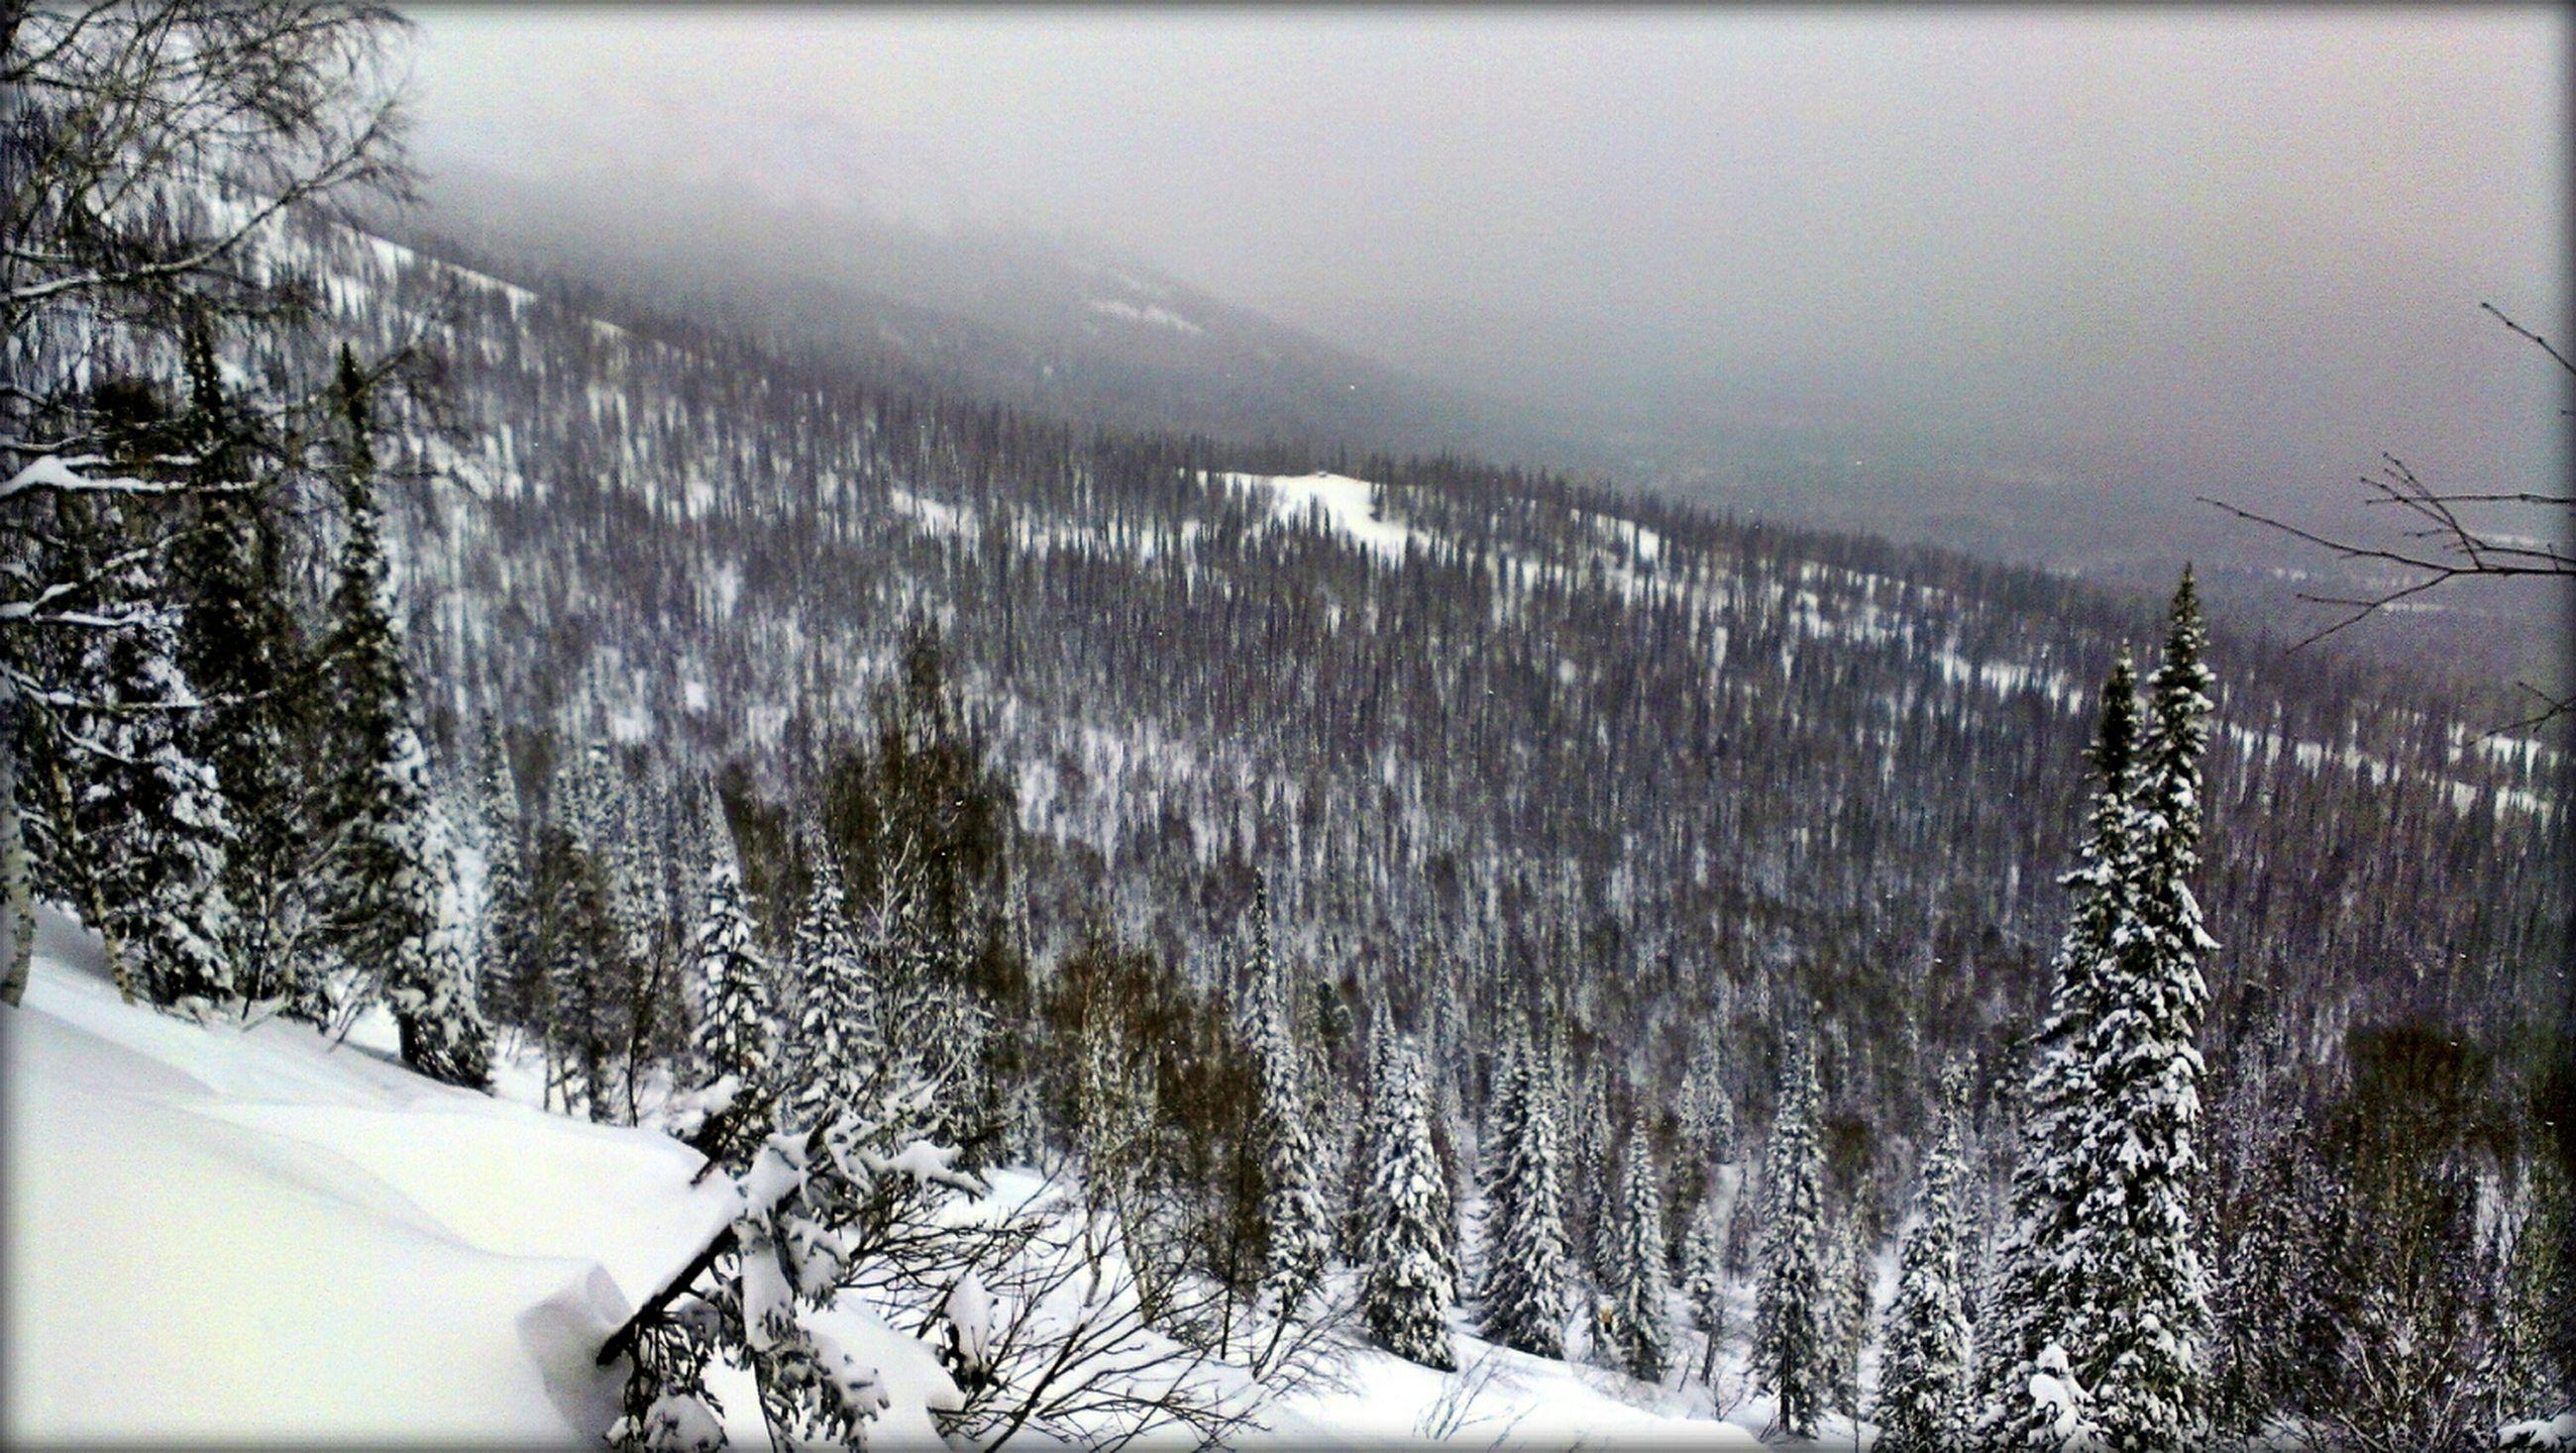 snow, winter, cold temperature, season, weather, frozen, tree, covering, tranquility, tranquil scene, nature, covered, beauty in nature, white color, scenics, landscape, snow covered, cold, non-urban scene, bare tree